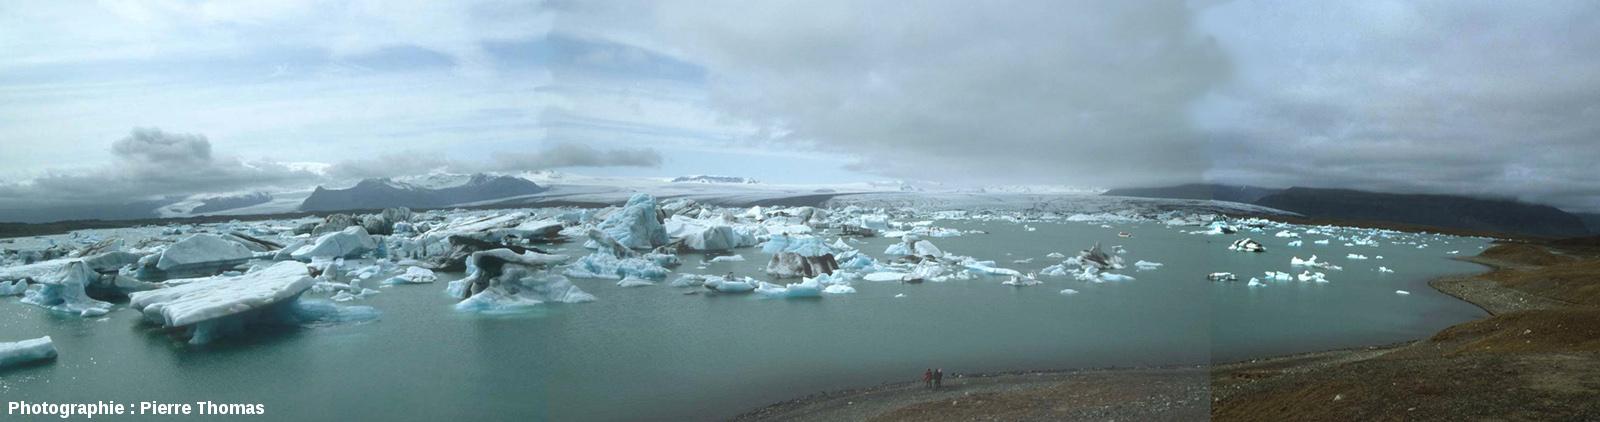 Le Vatnajökull (Islande) se jetant dans le Jökulsarlon